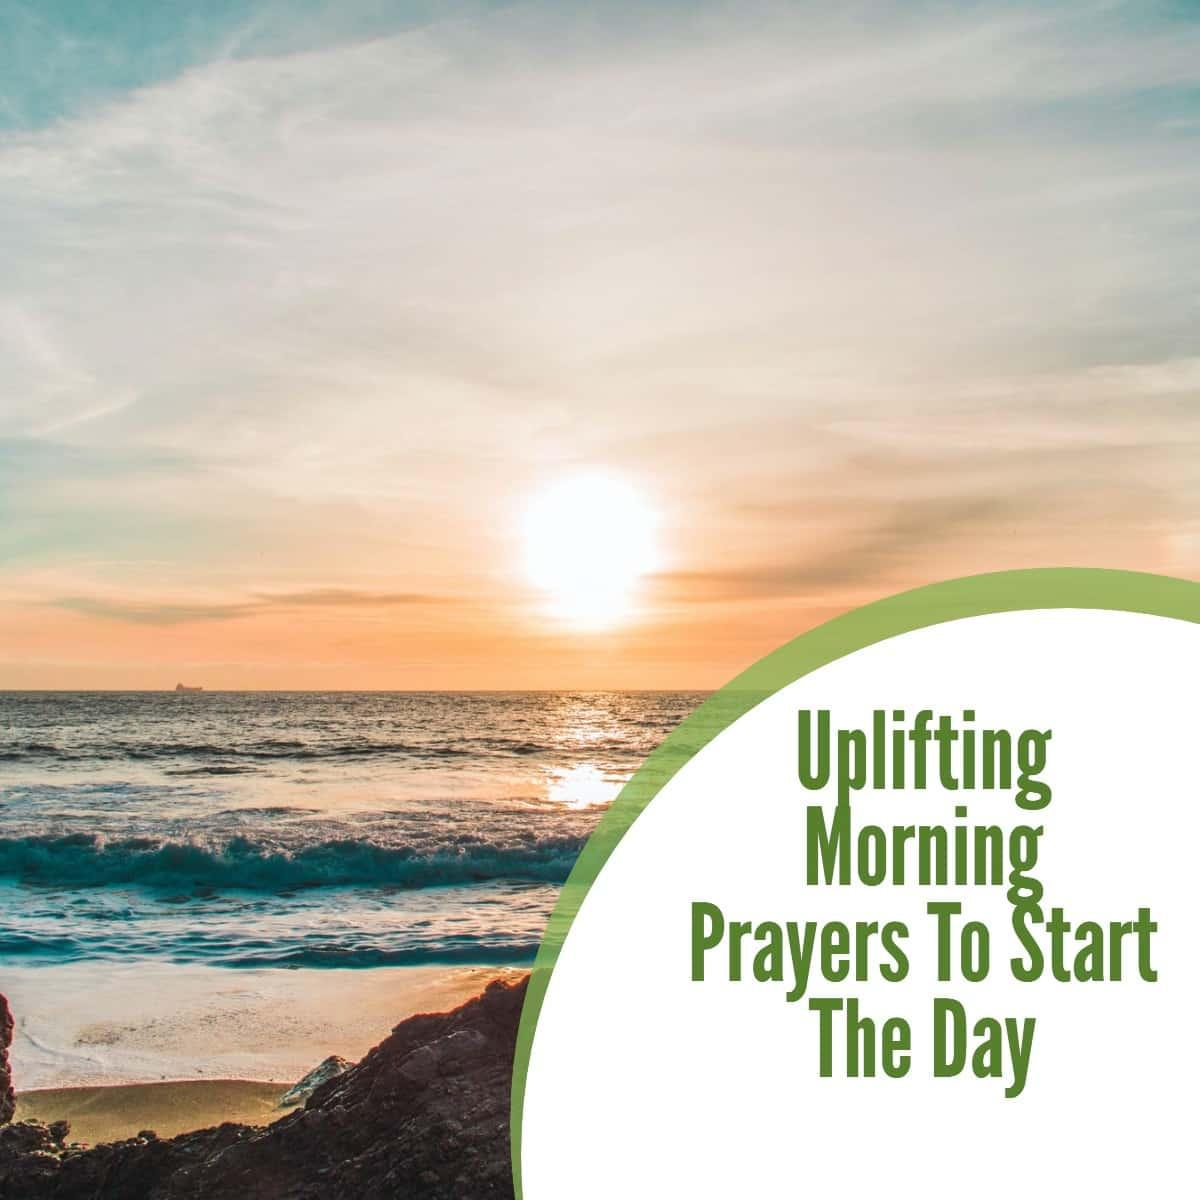 Uplifting Morning Prayers To Start The Day